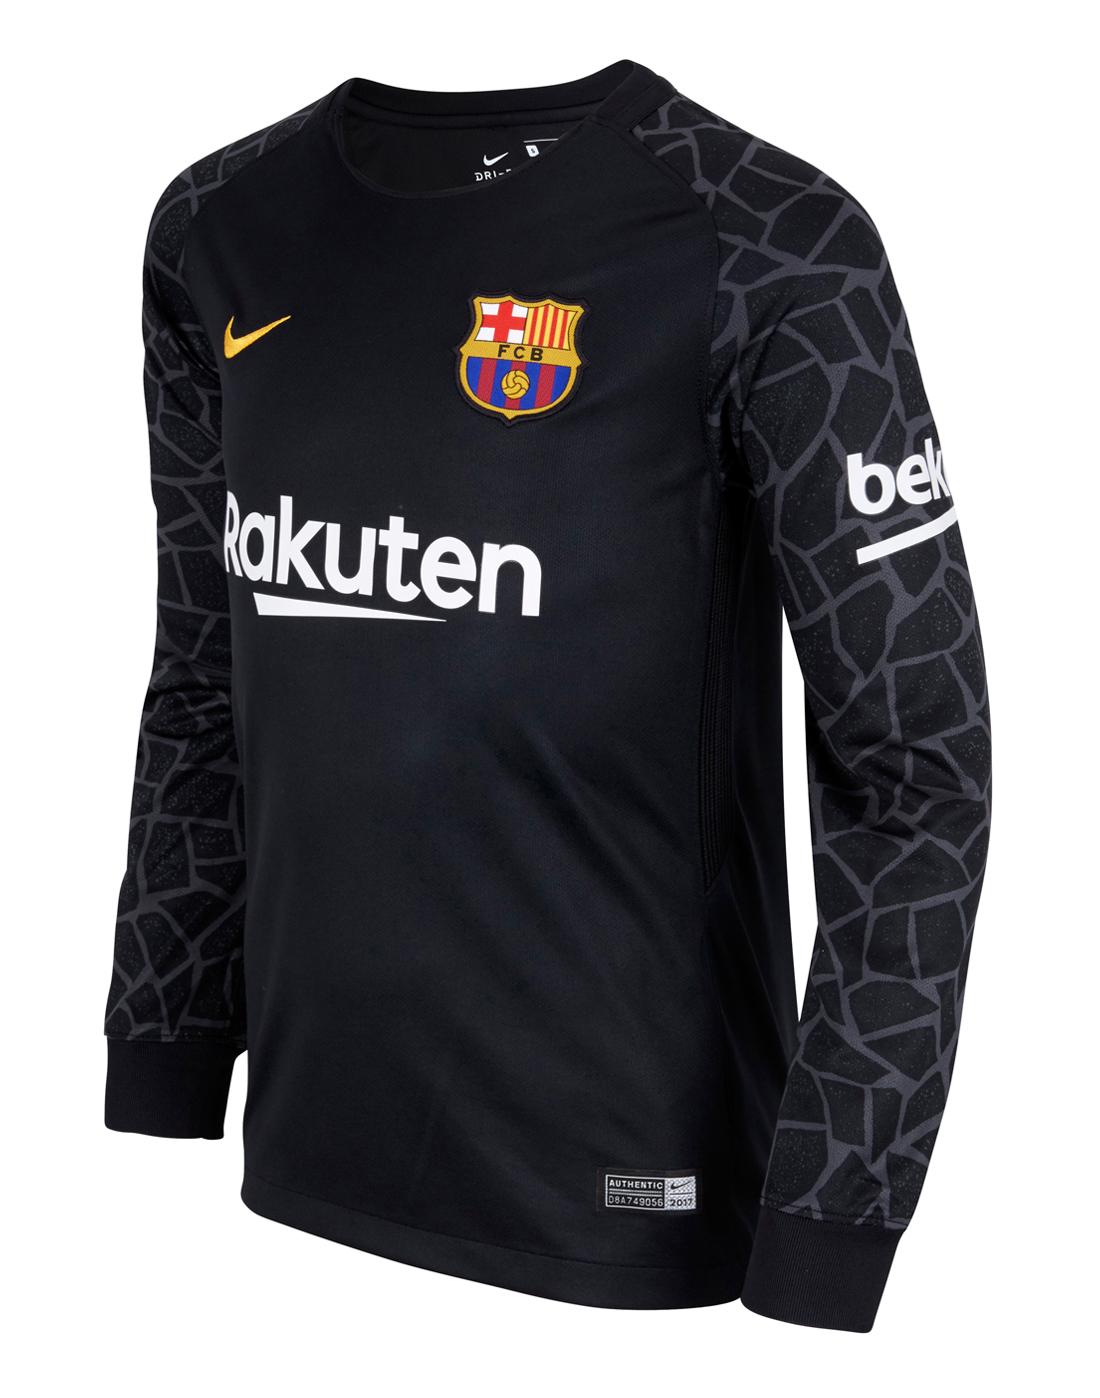 outlet store d3af3 5f62f Nike Kids Barcelona 17/18 Home GK Jersey | Life Style Sports